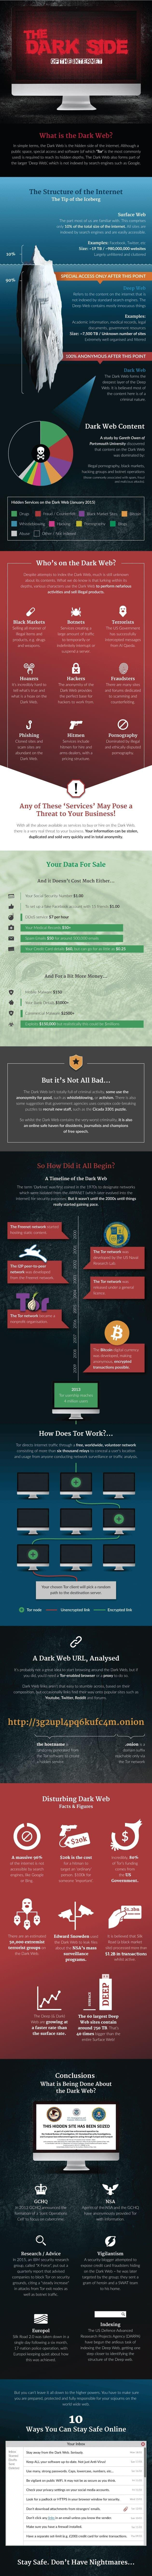 The dark web infographic